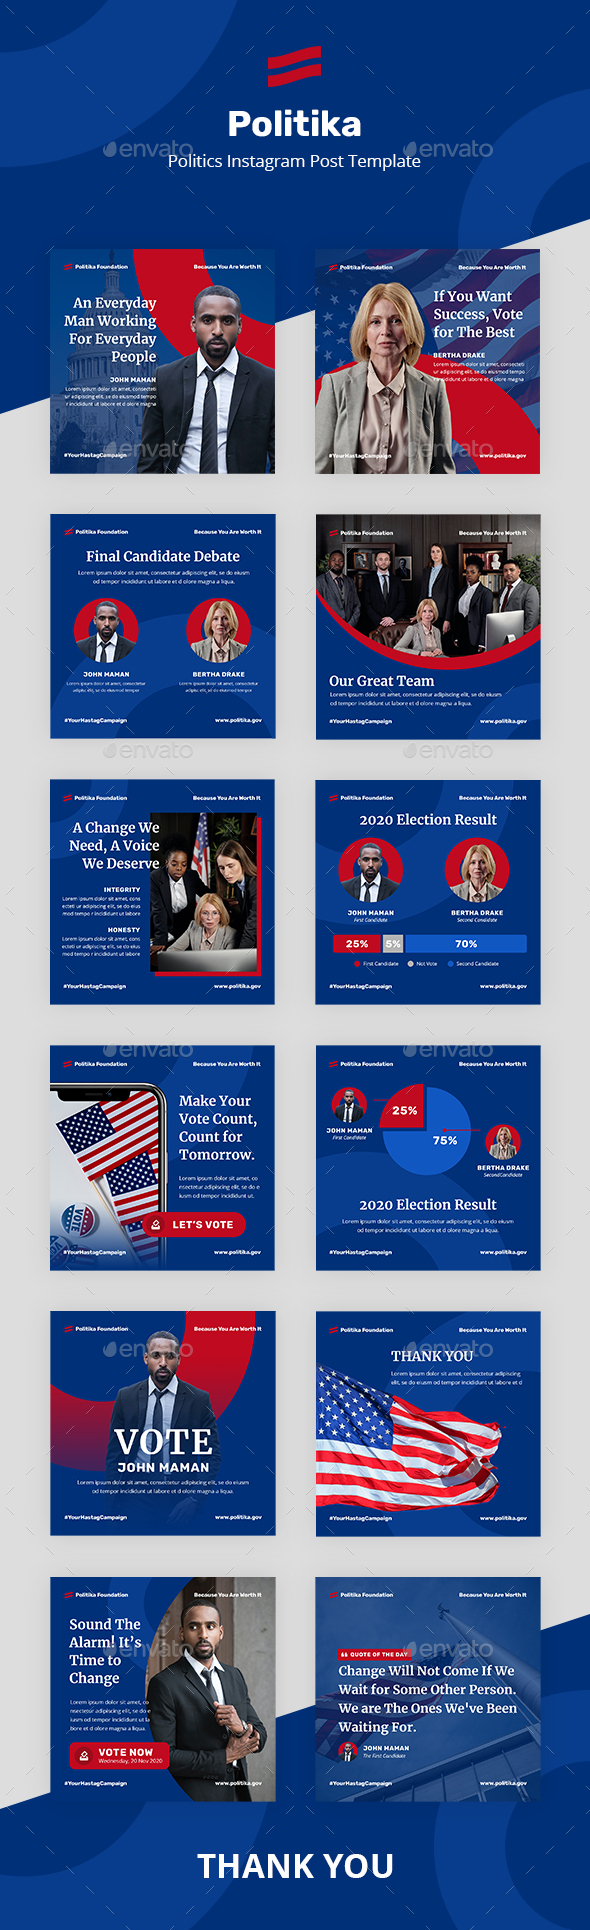 Politika: Politics Instagram Post Template